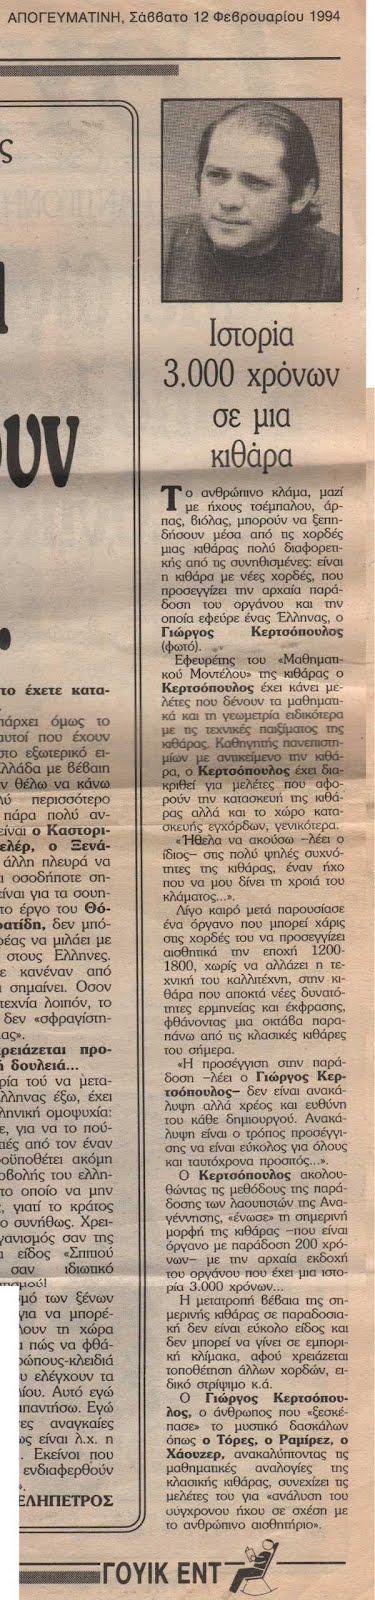 Apogevmatini-Kertsopoulos 1994